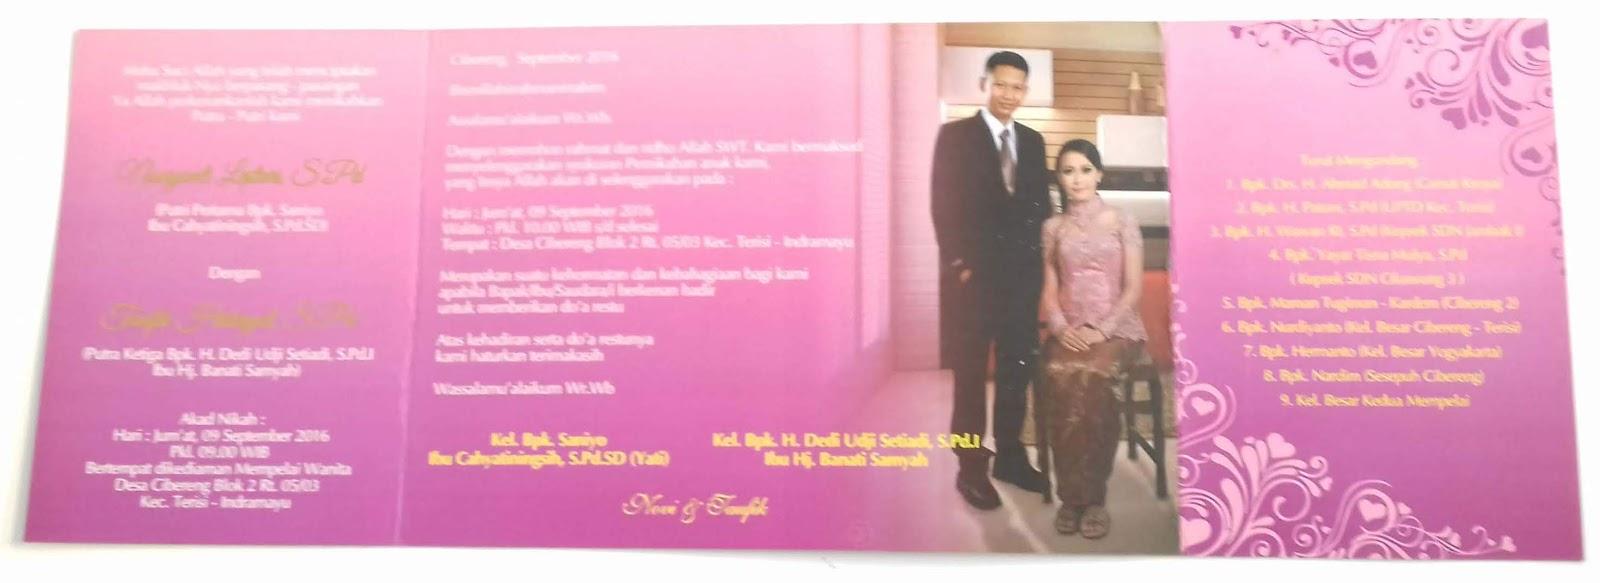 Contoh Undangan Pernikahan Berwarna Atau Sparasi Alfi Percetakan Umahkertas Kuning Pink Dalem